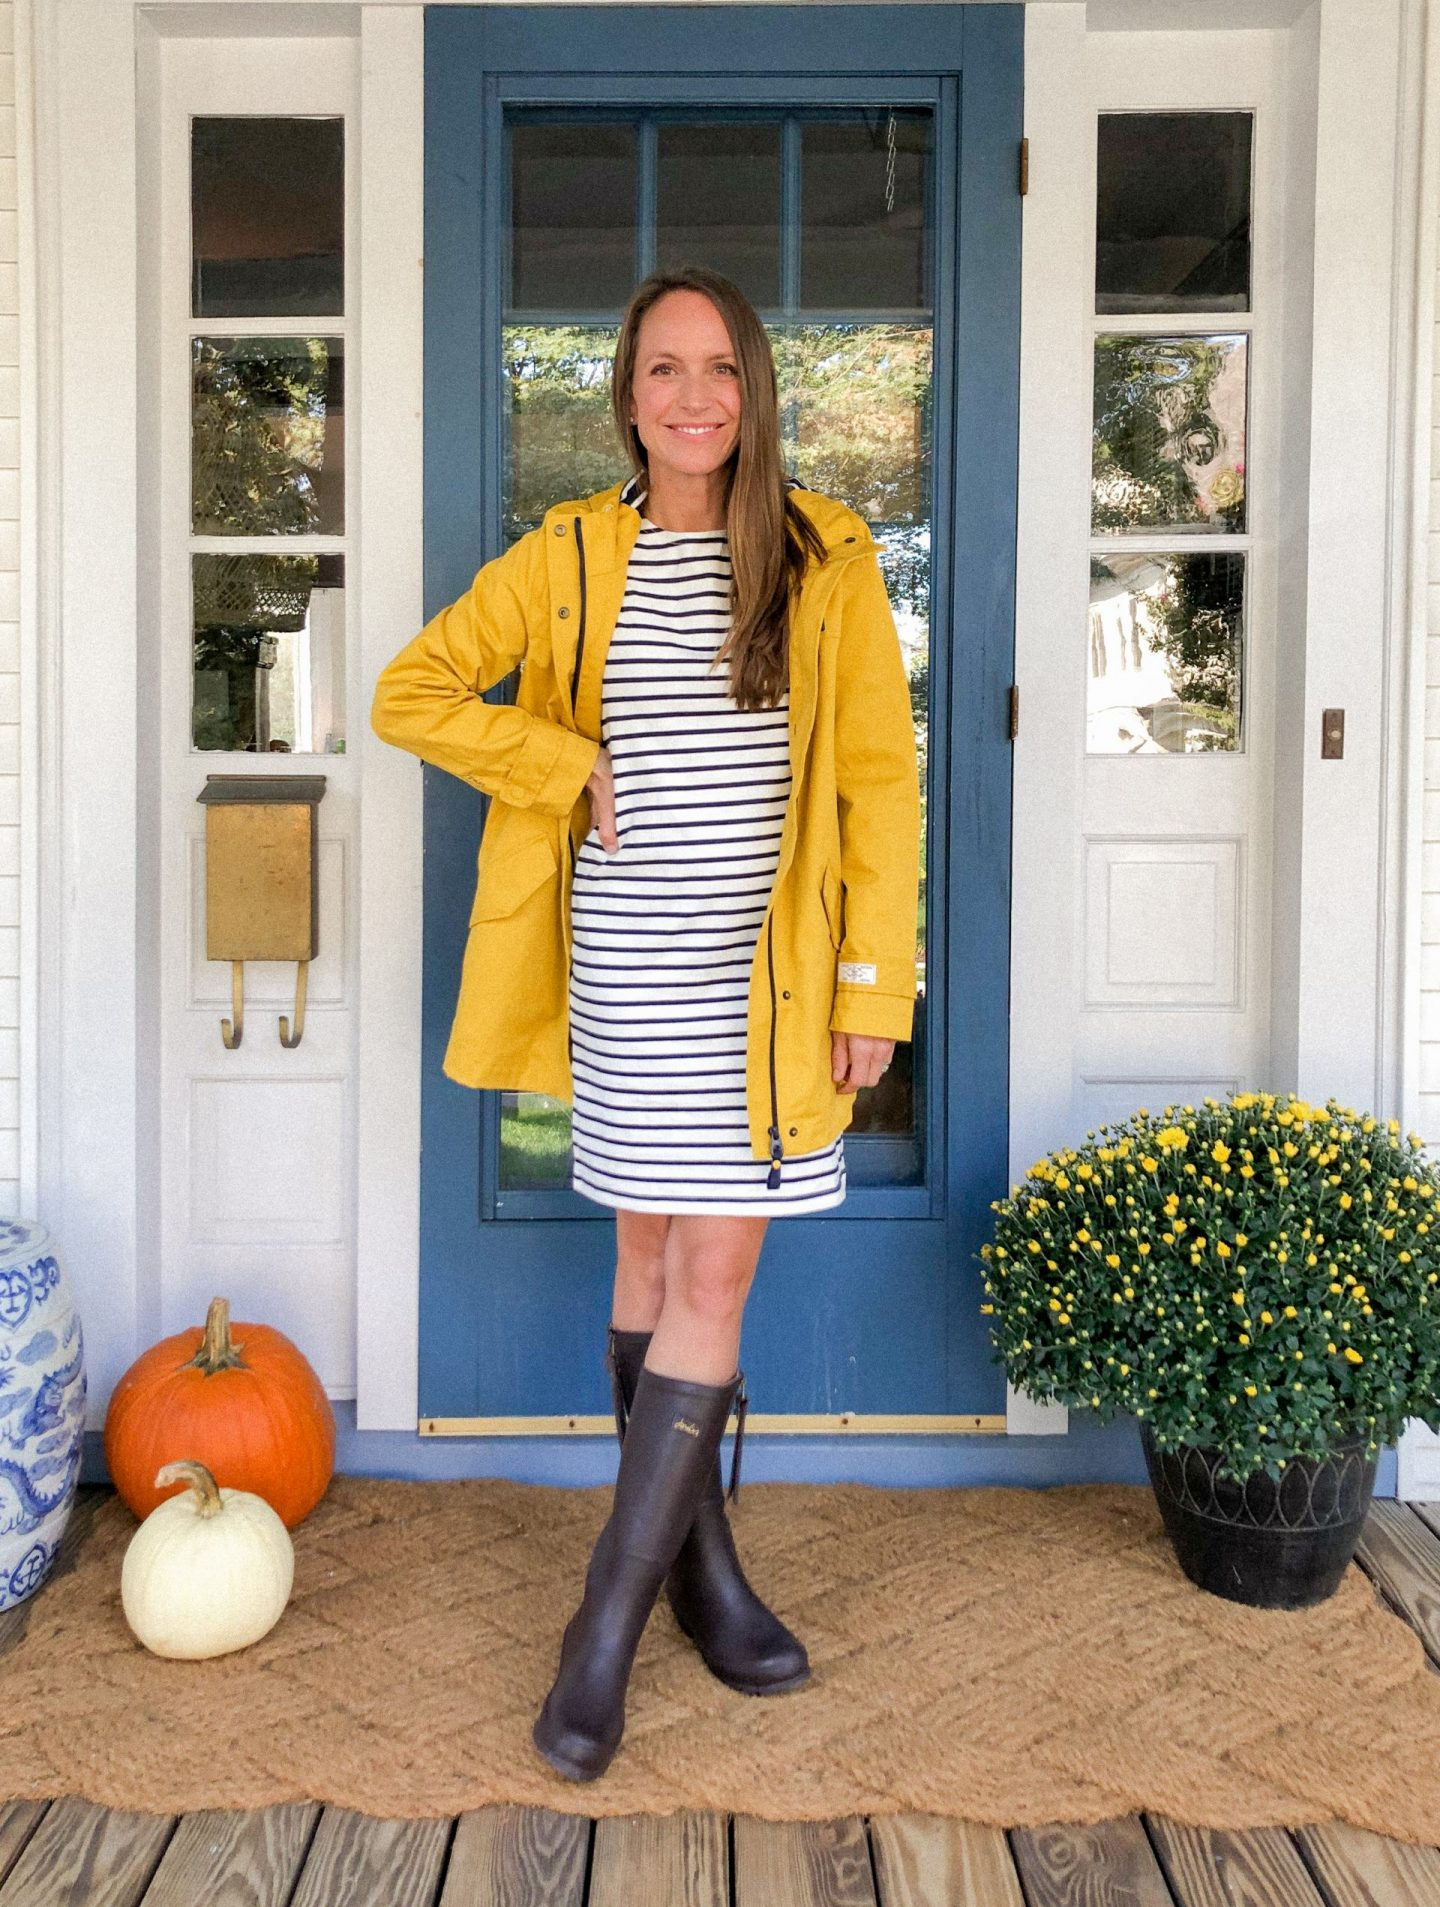 Right as Rain – 5 Ways to Wear a Yellow Rain Jacket